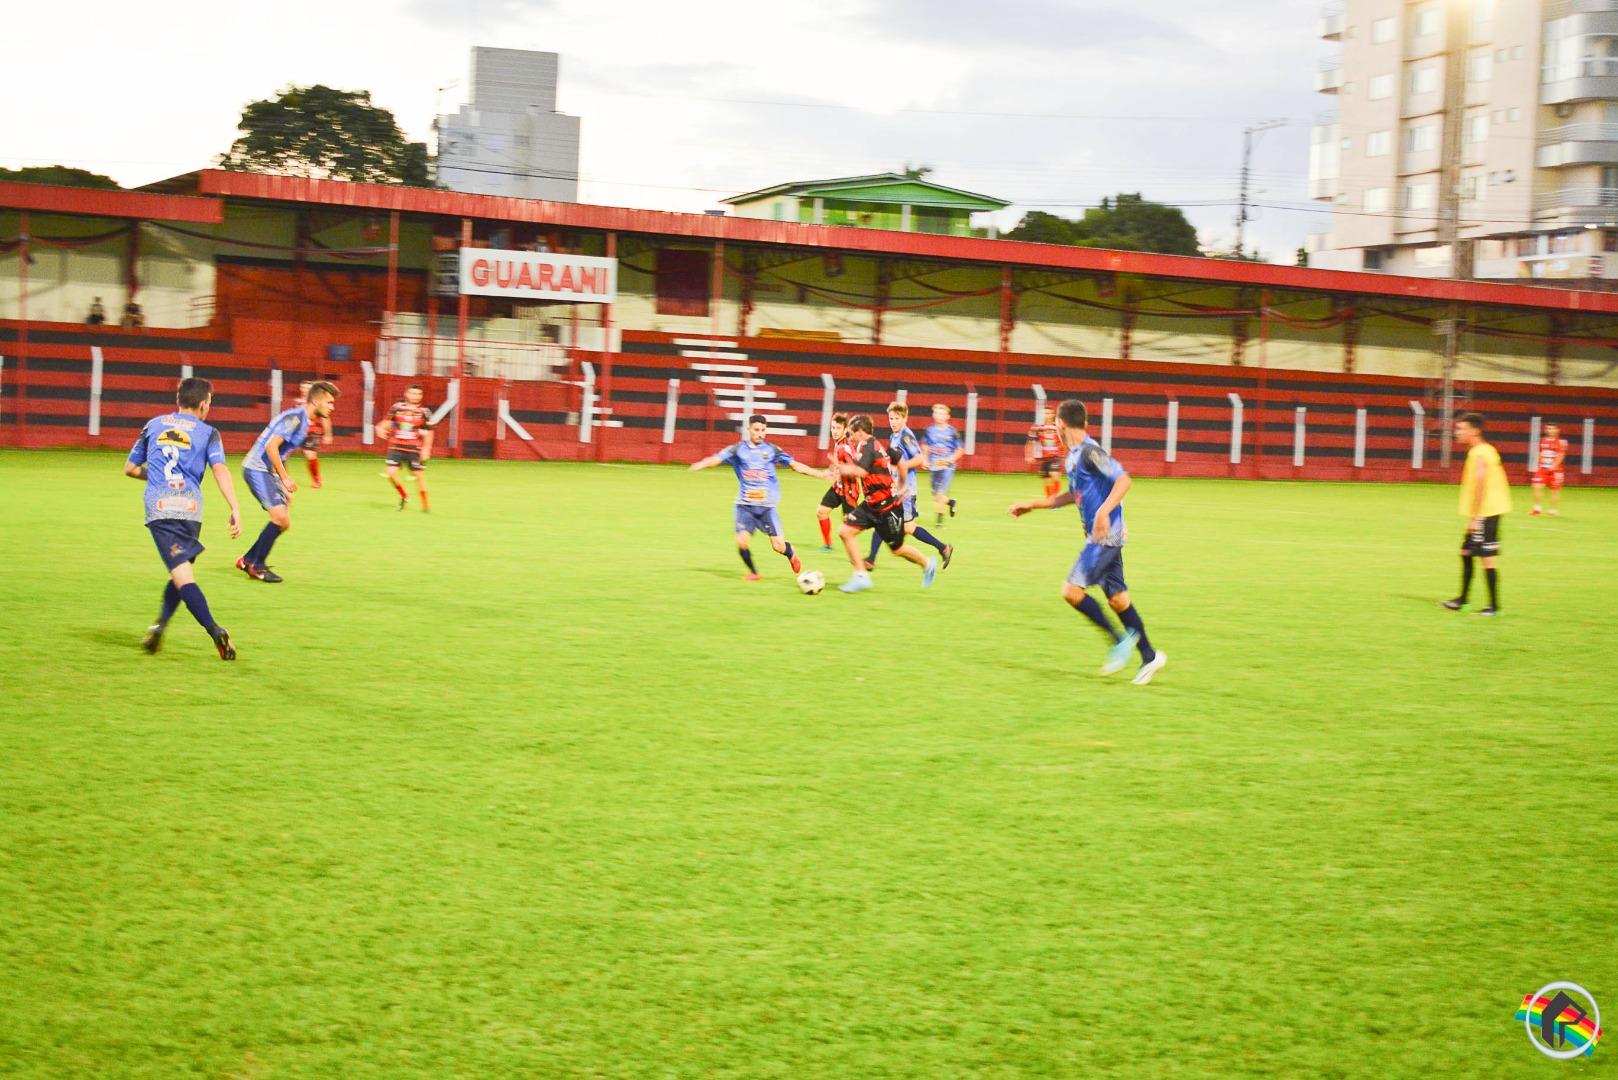 Guarani realiza treino contra jovens atletas de Chapecó